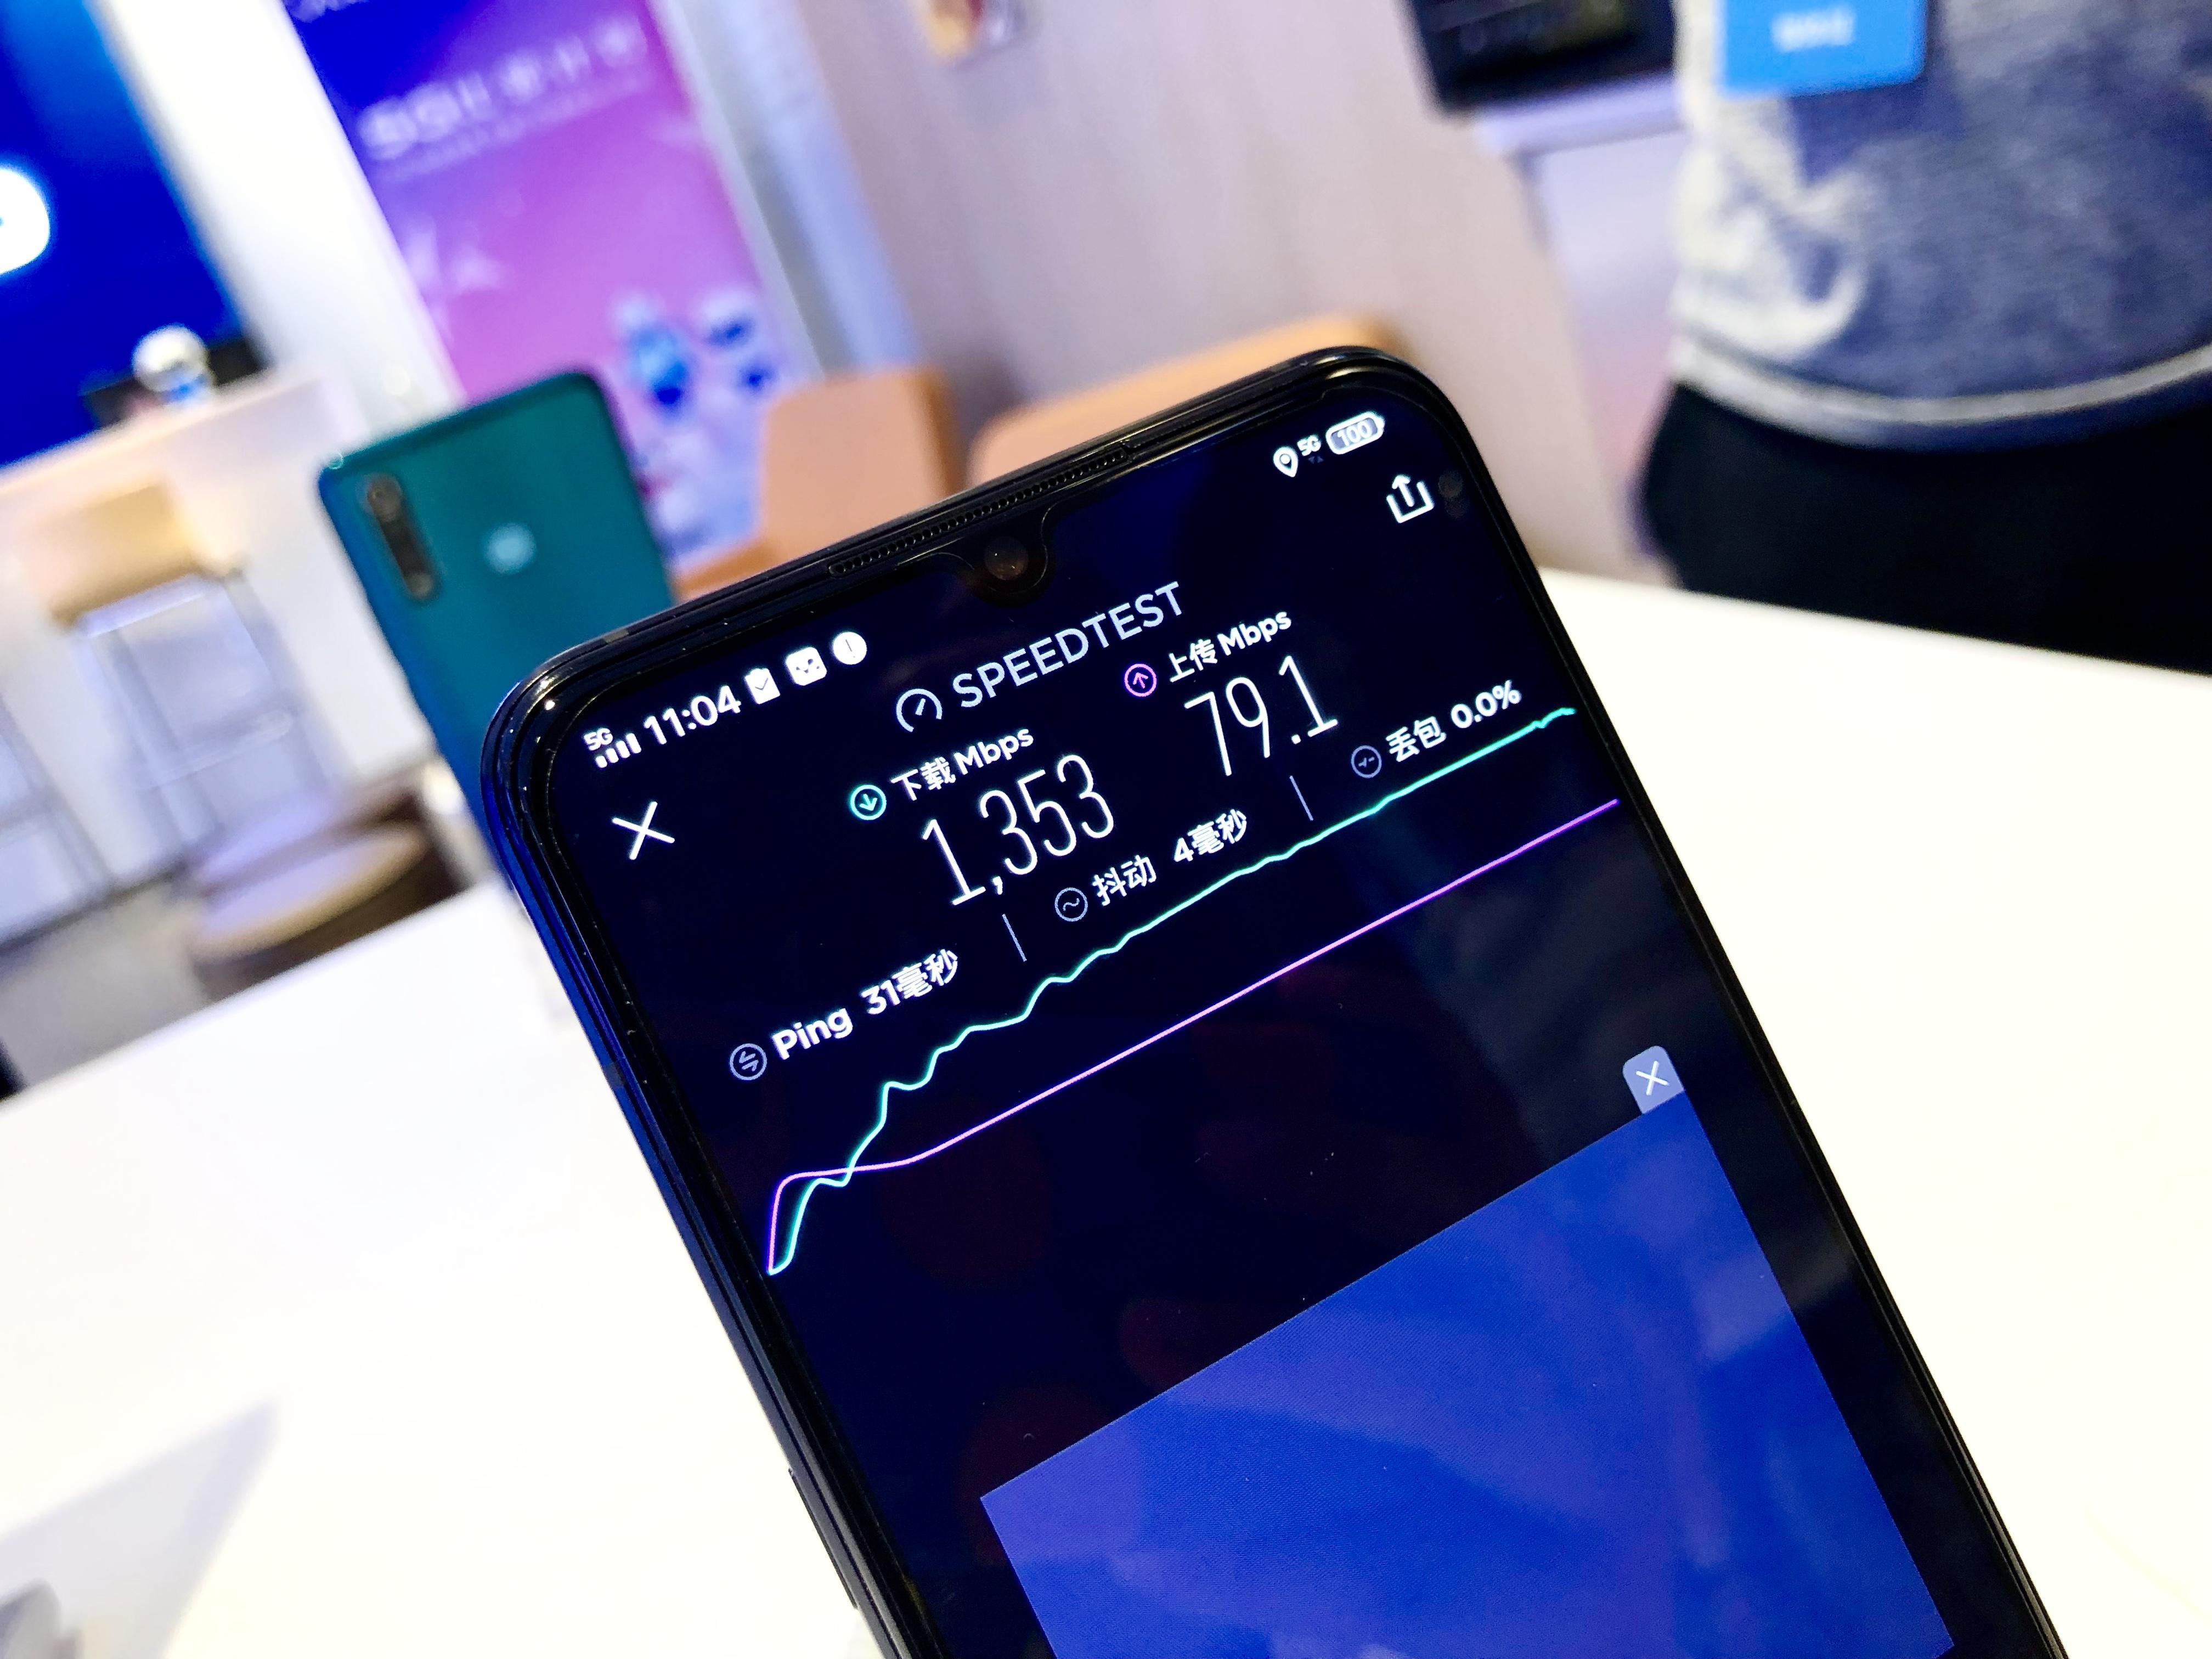 vivo计划在百家门店开设5G体验区 秦飞:首款5G手机8月上市